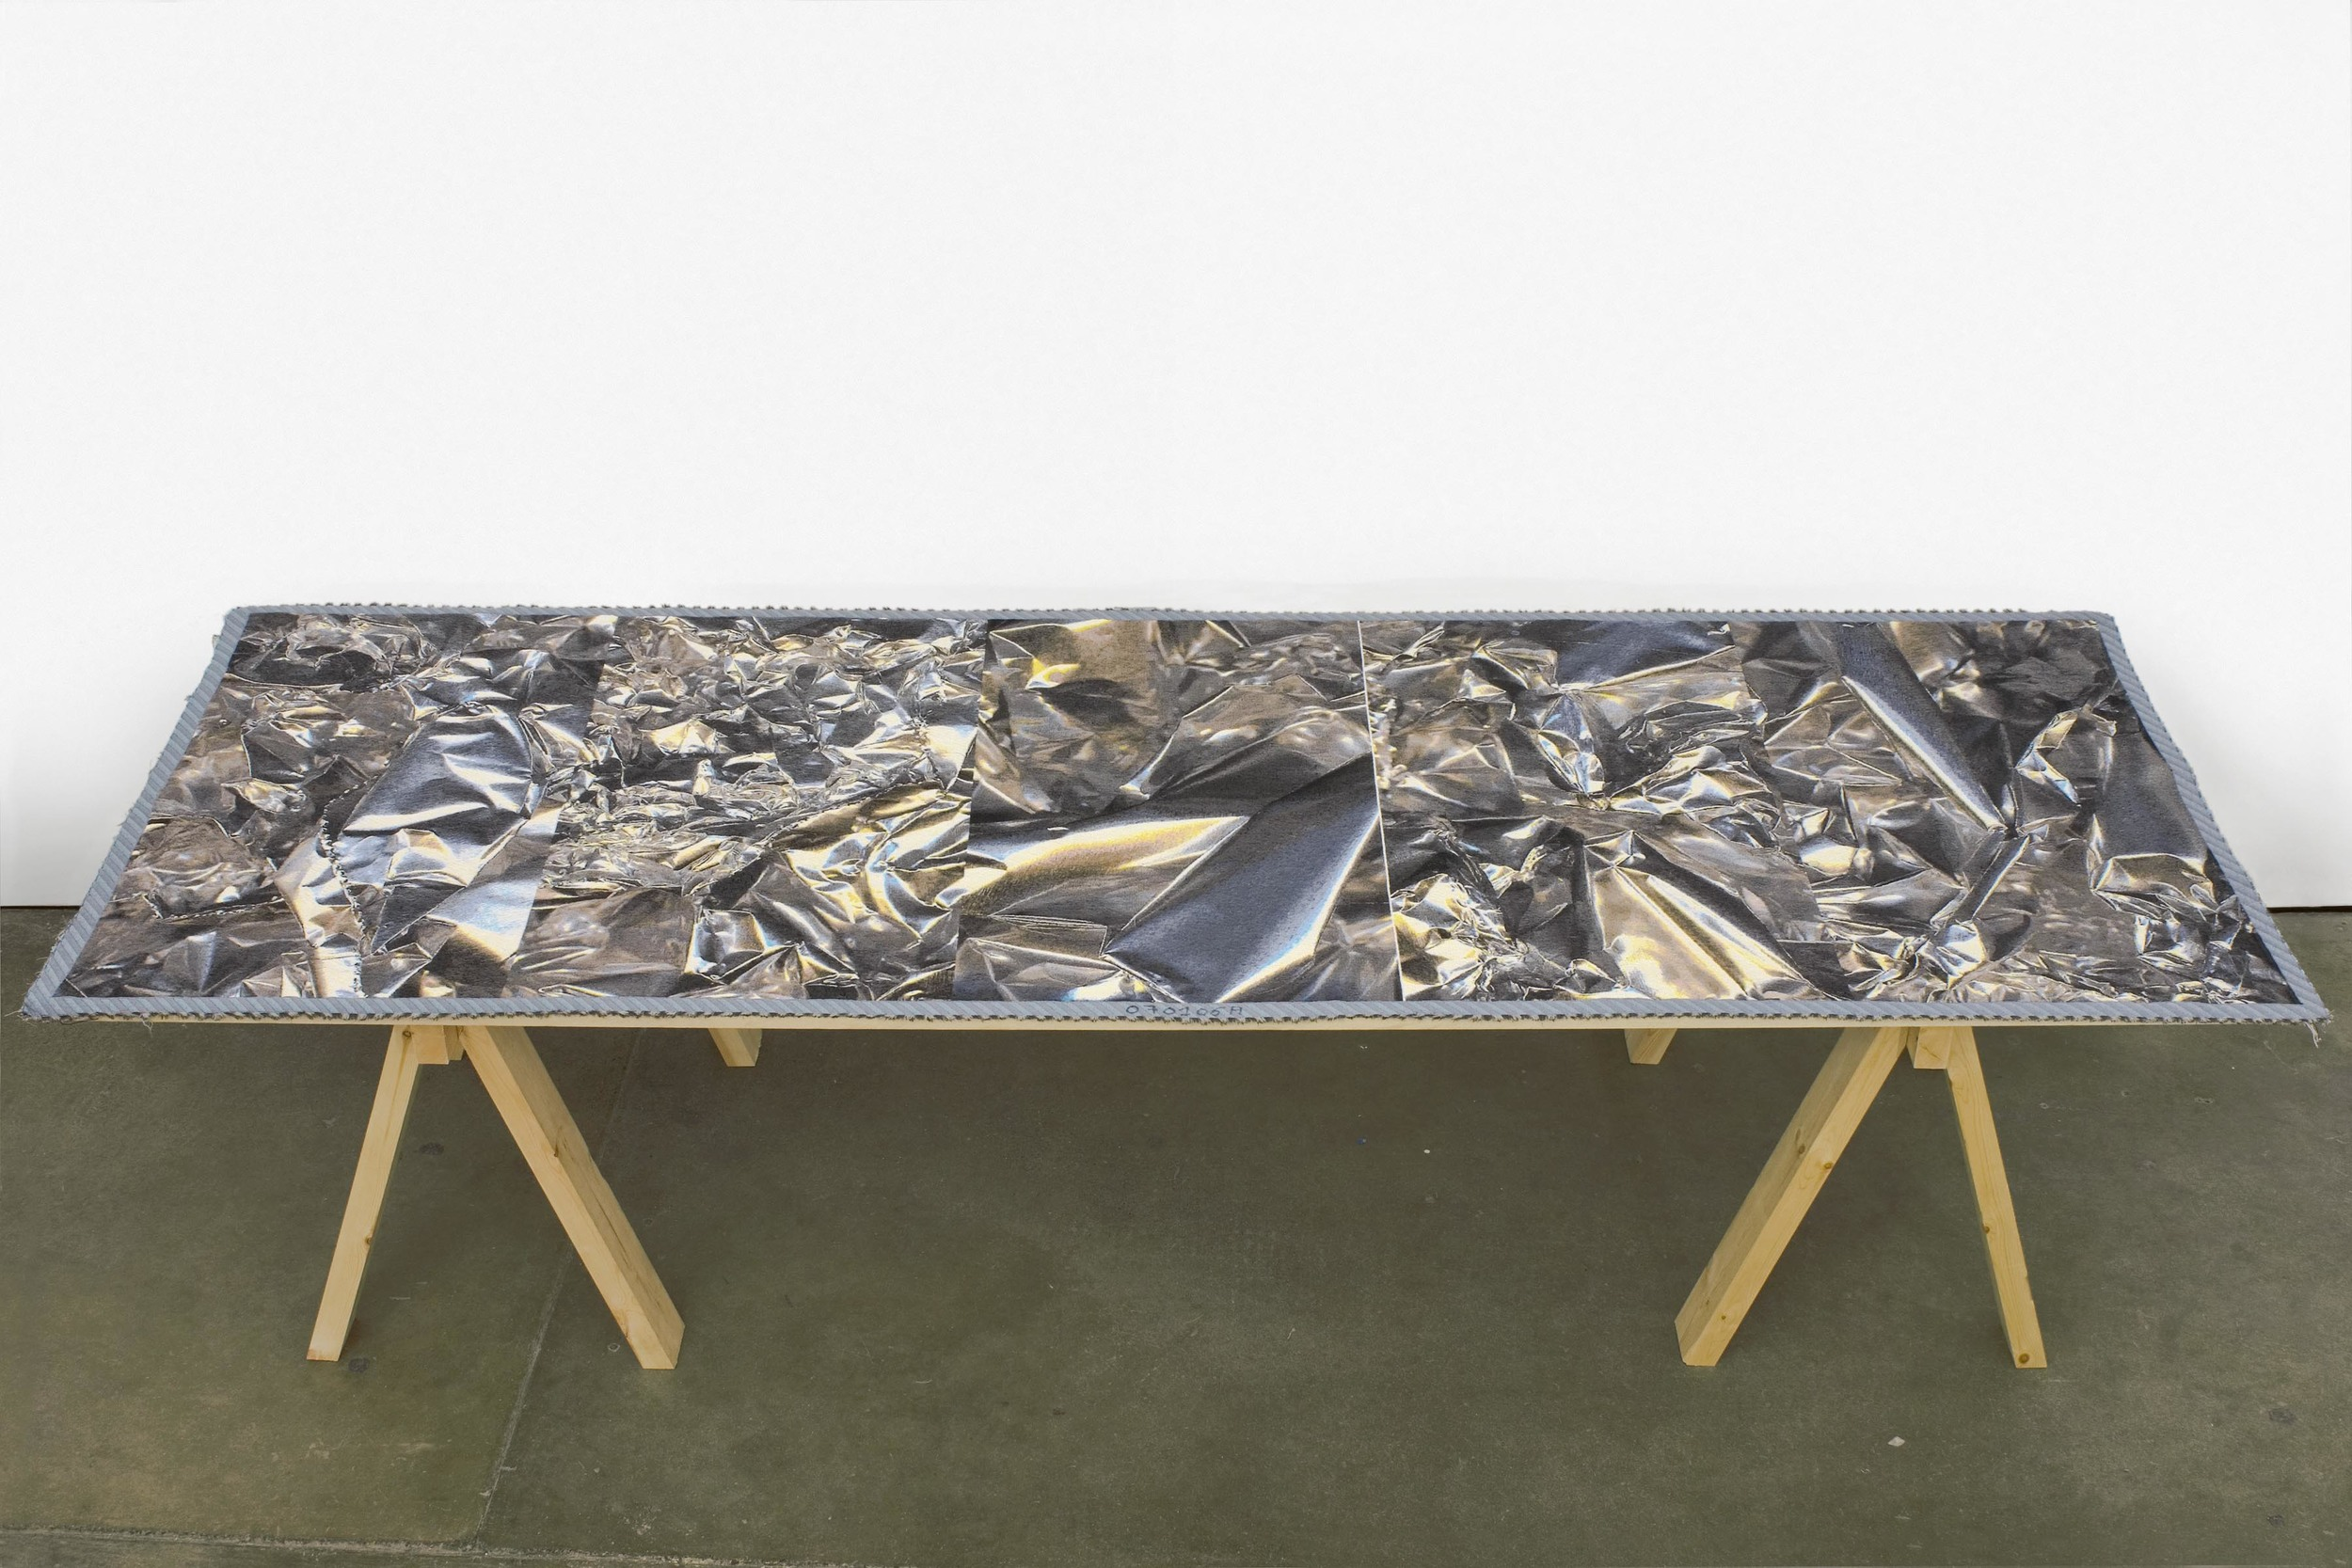 Pae White Kitchenscrap Tablecloth 2007 Cotton and Trevira 293.37 x 102.87 cm